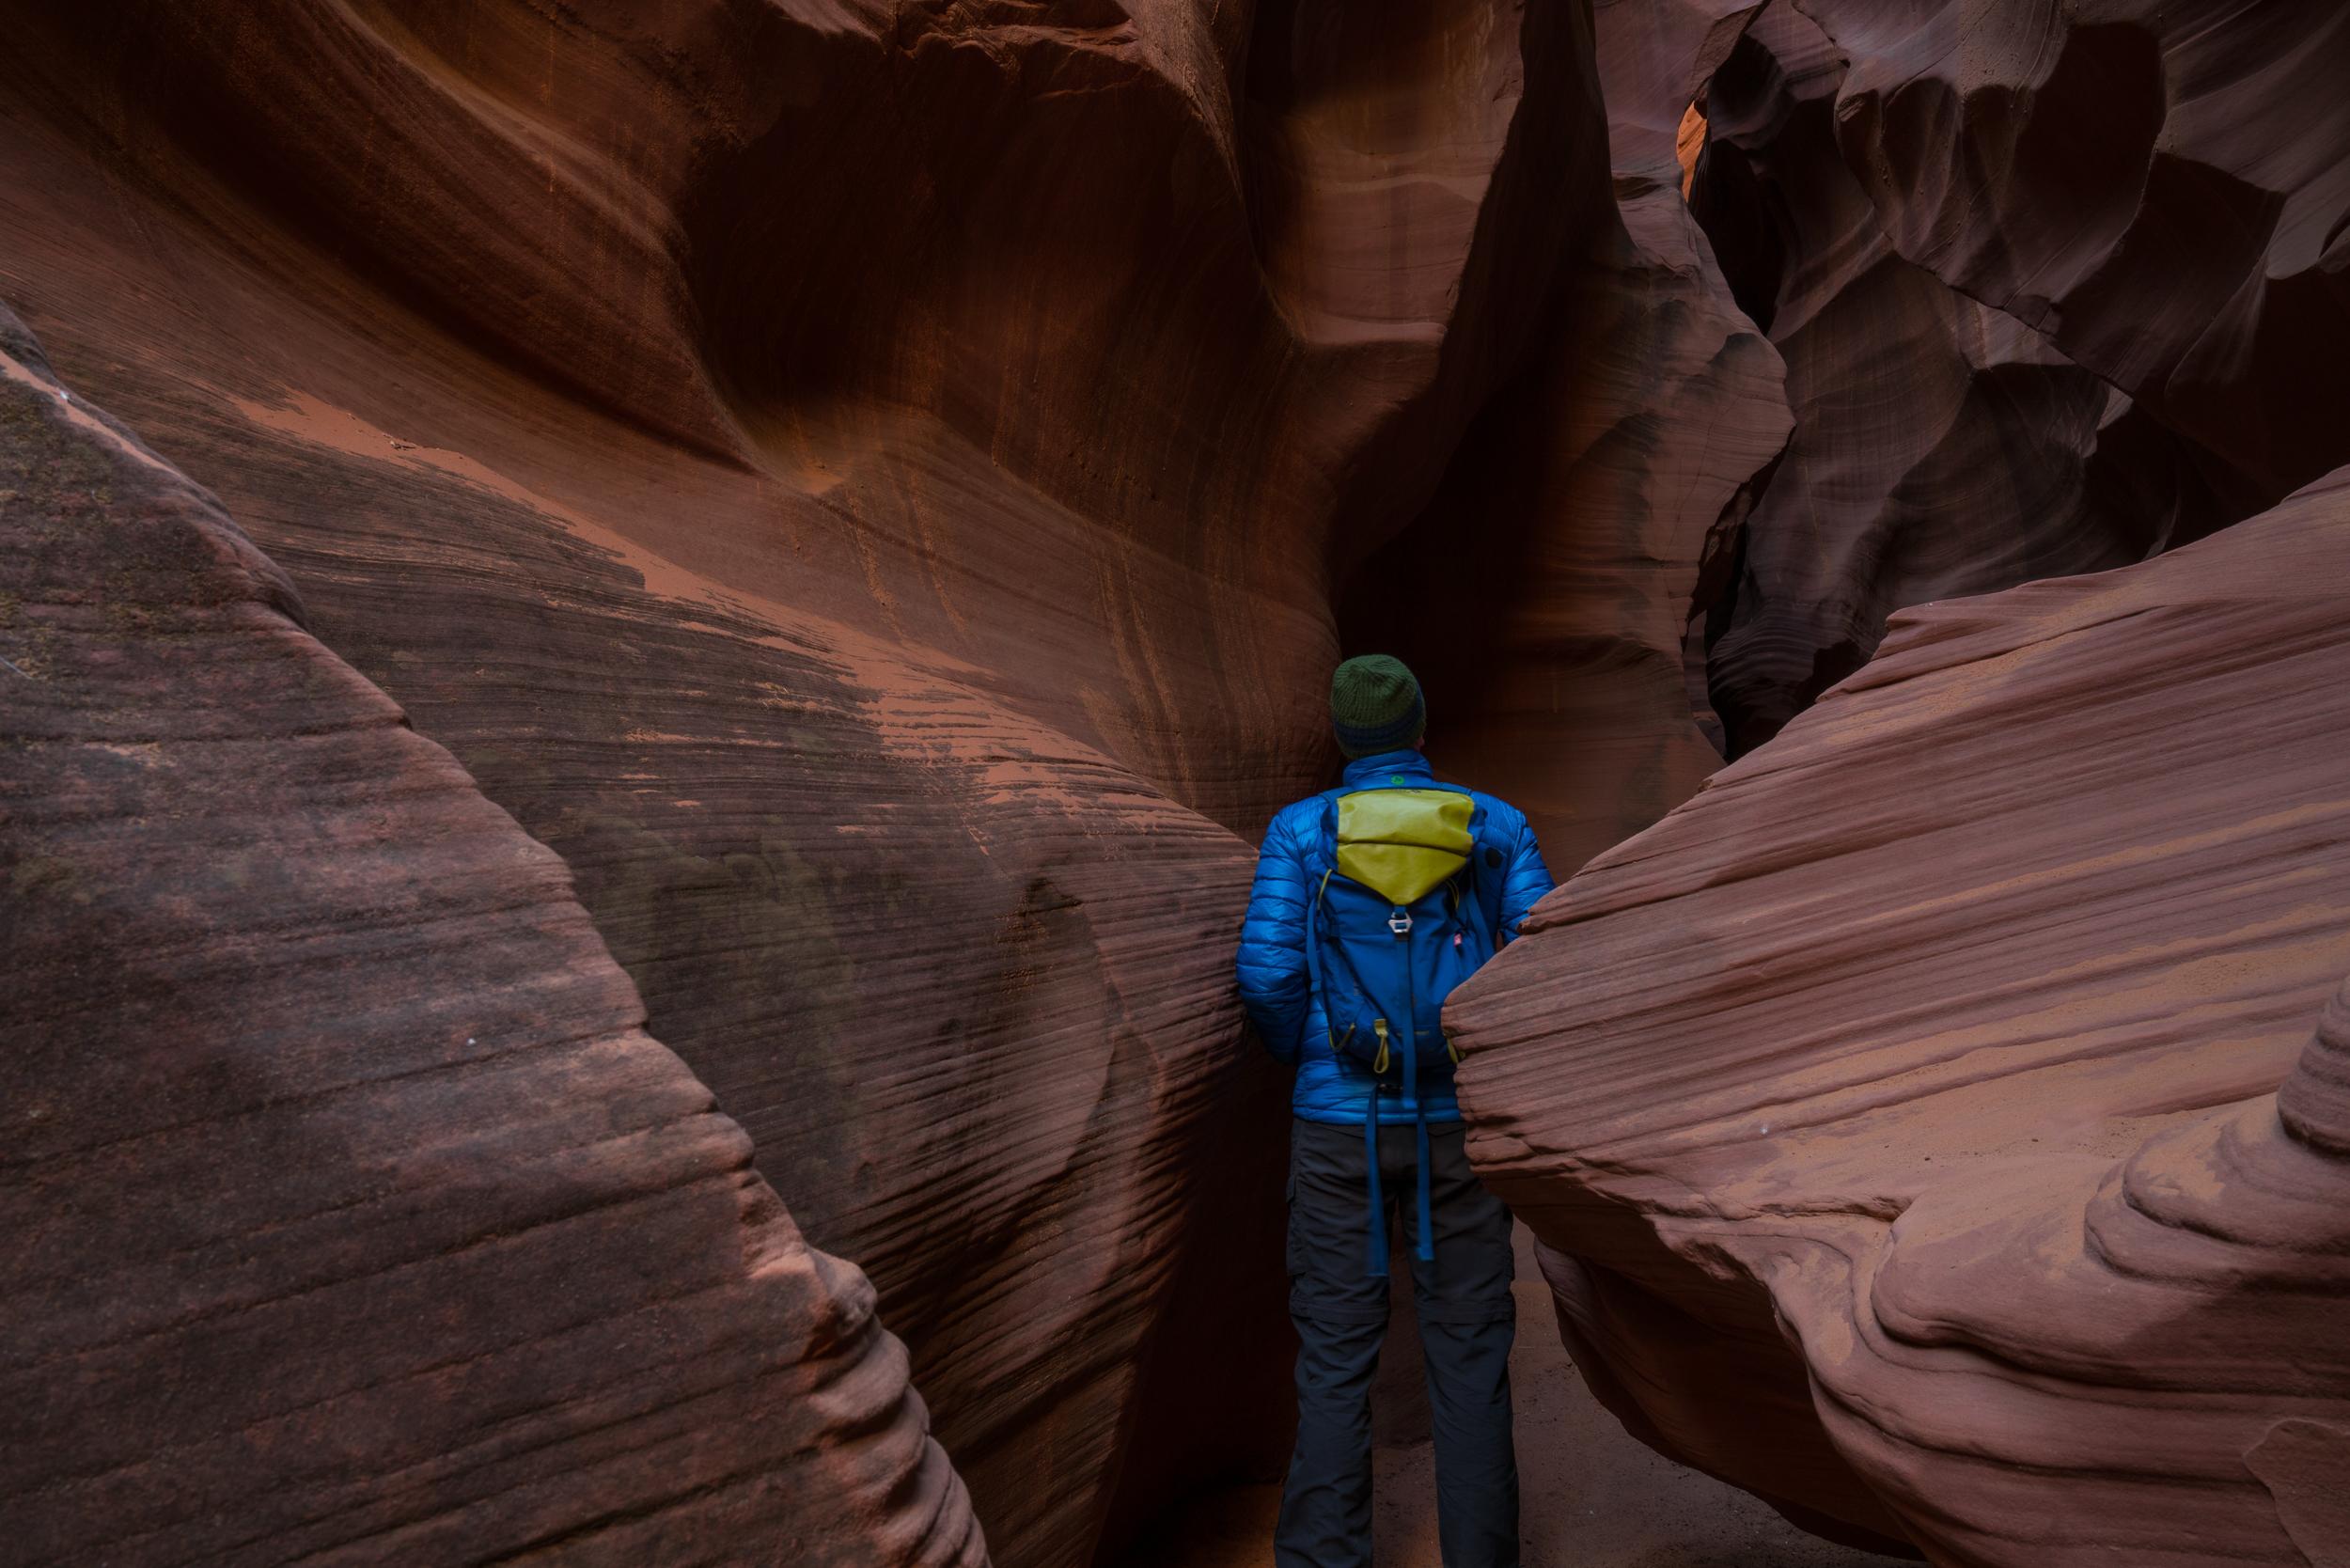 Person standing inside AZ slot canyon